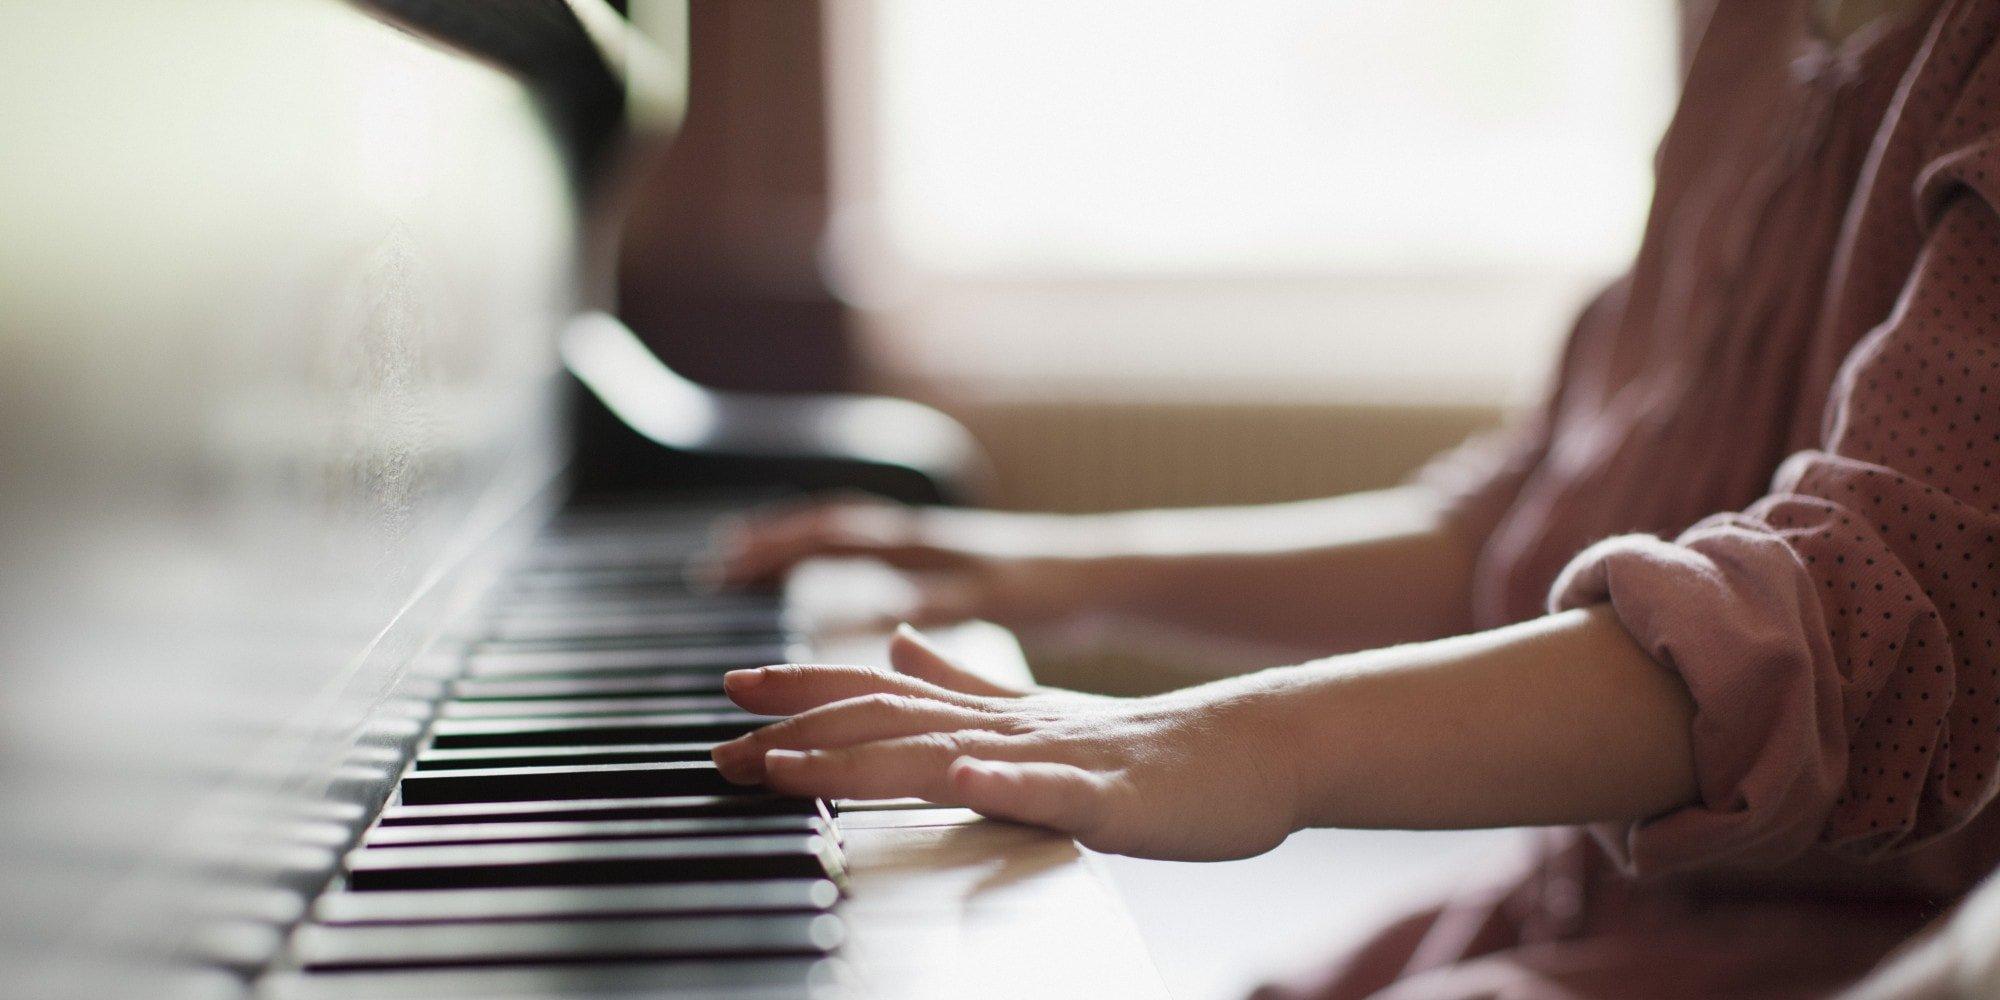 bambino suona pianoforte